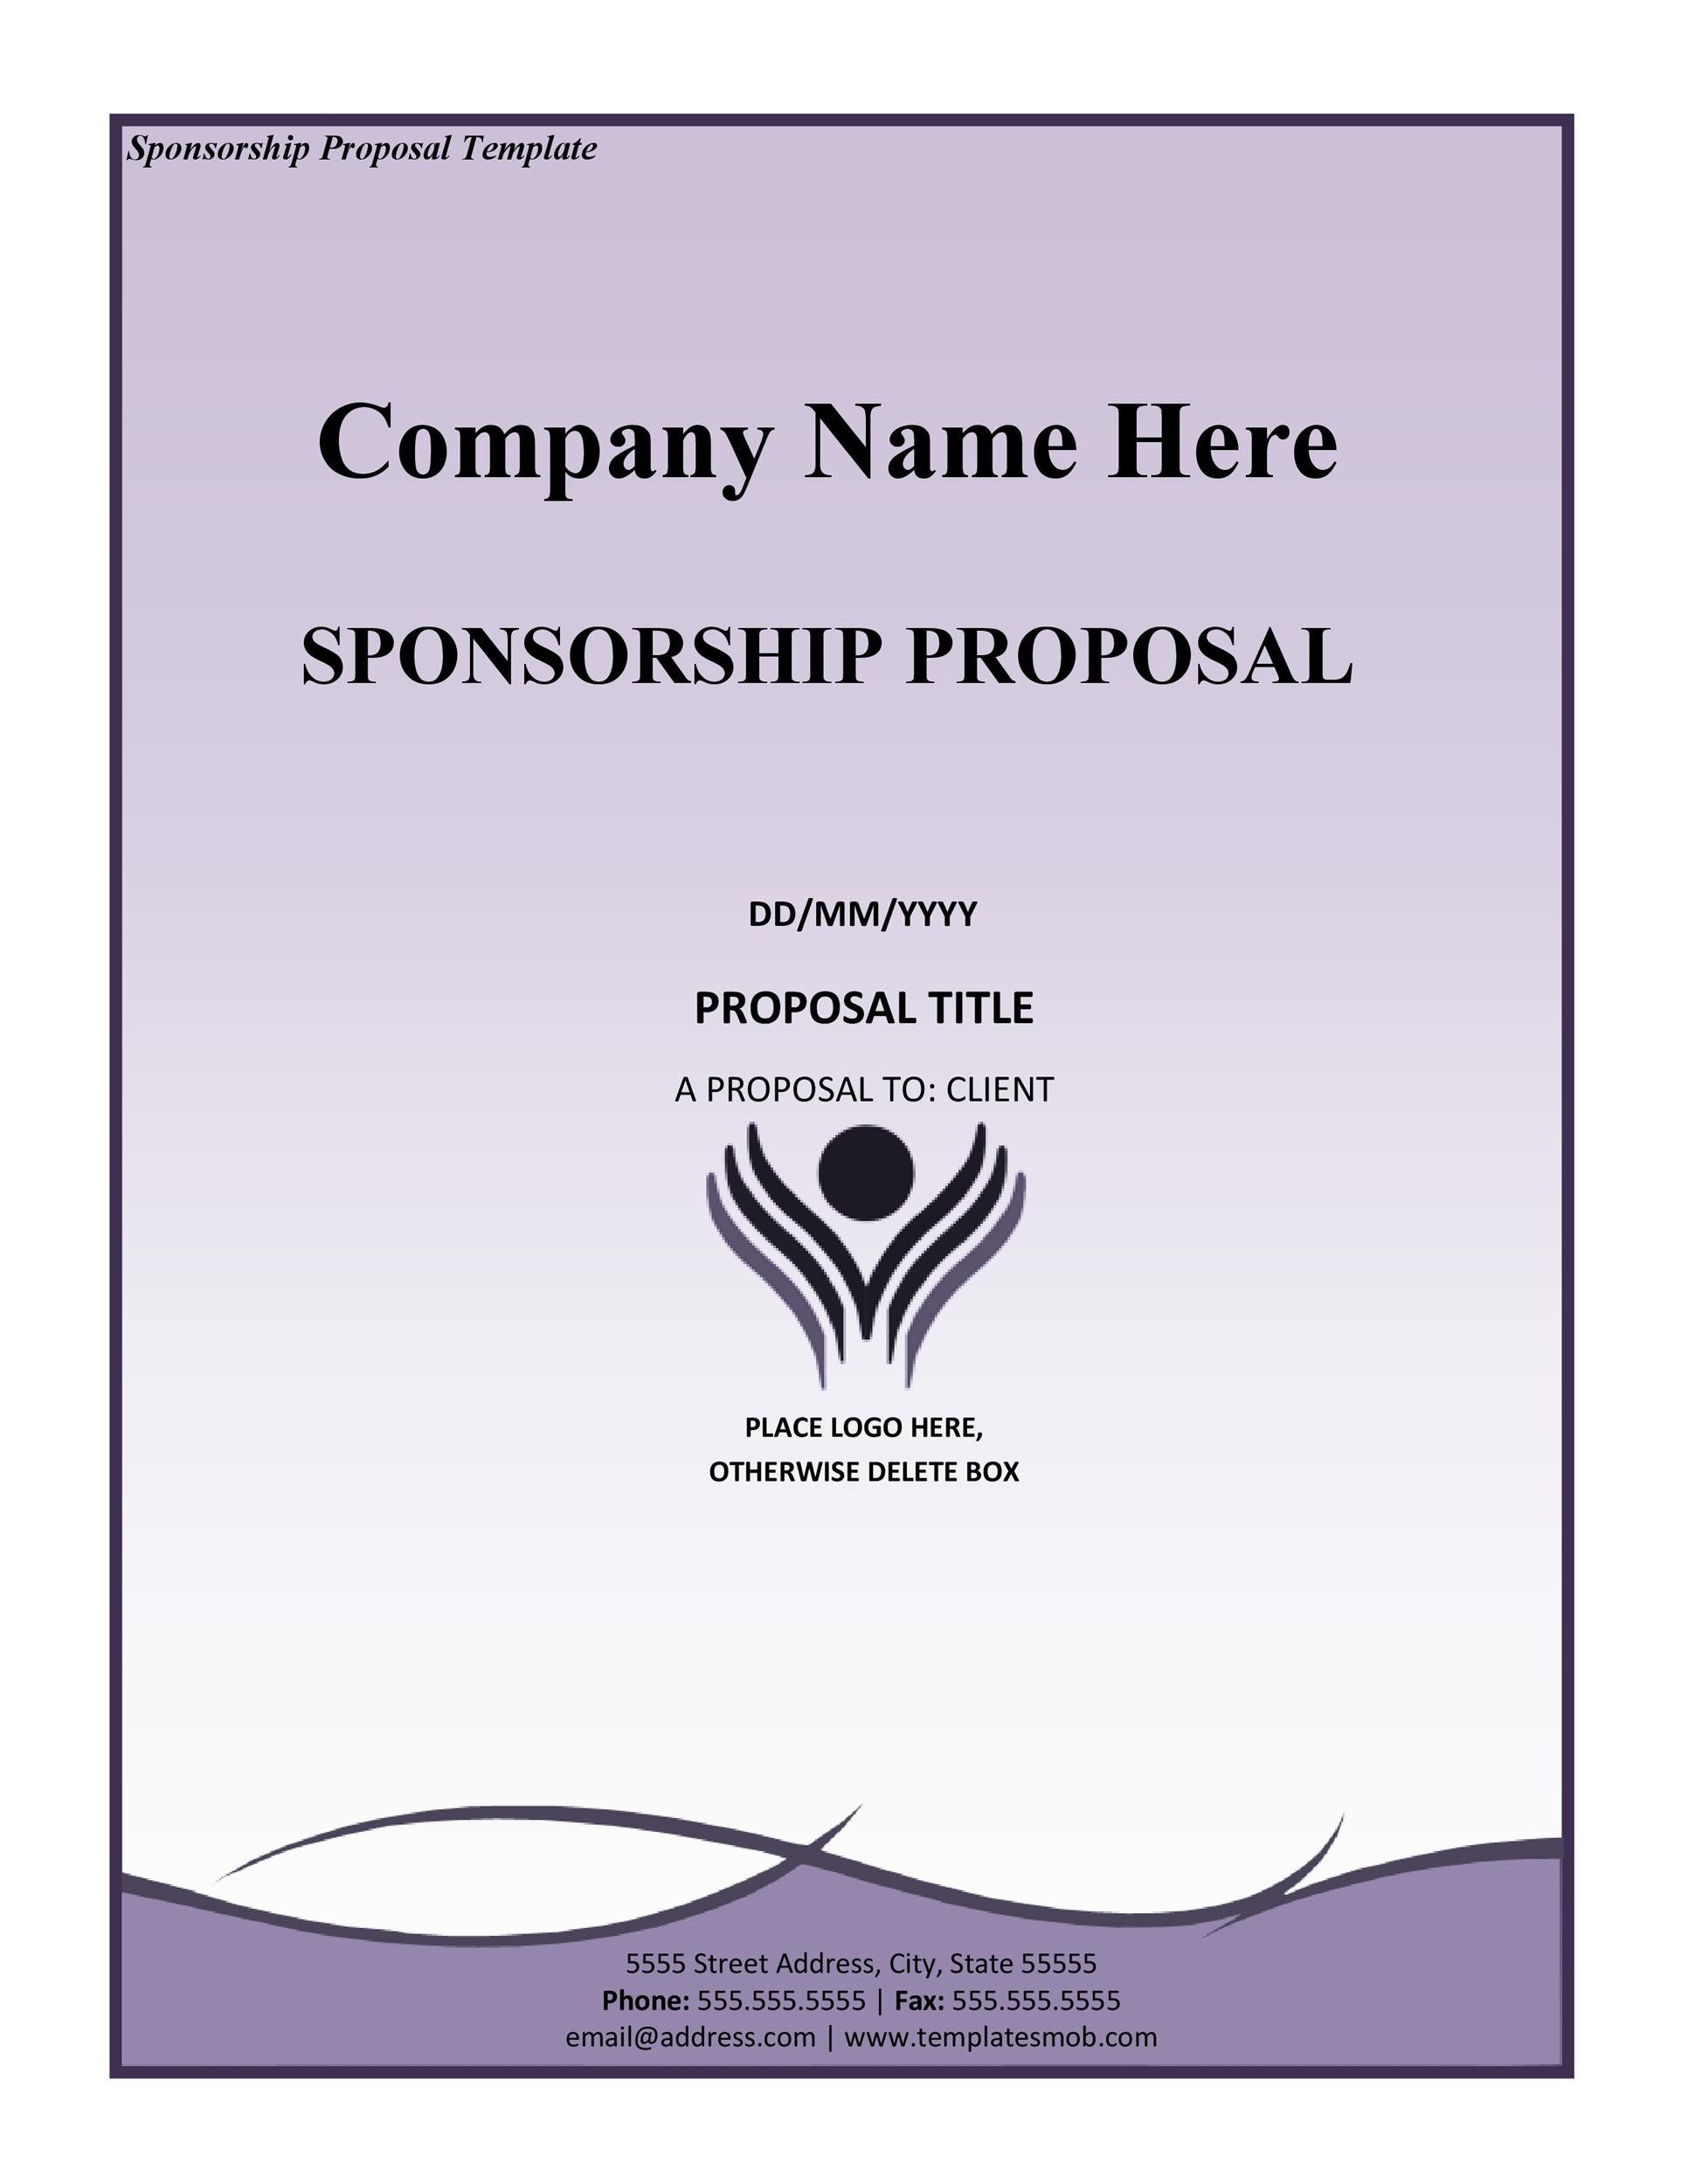 40+ Sponsorship Letter  Sponsorship Proposal Templates - proposal template for sponsorship